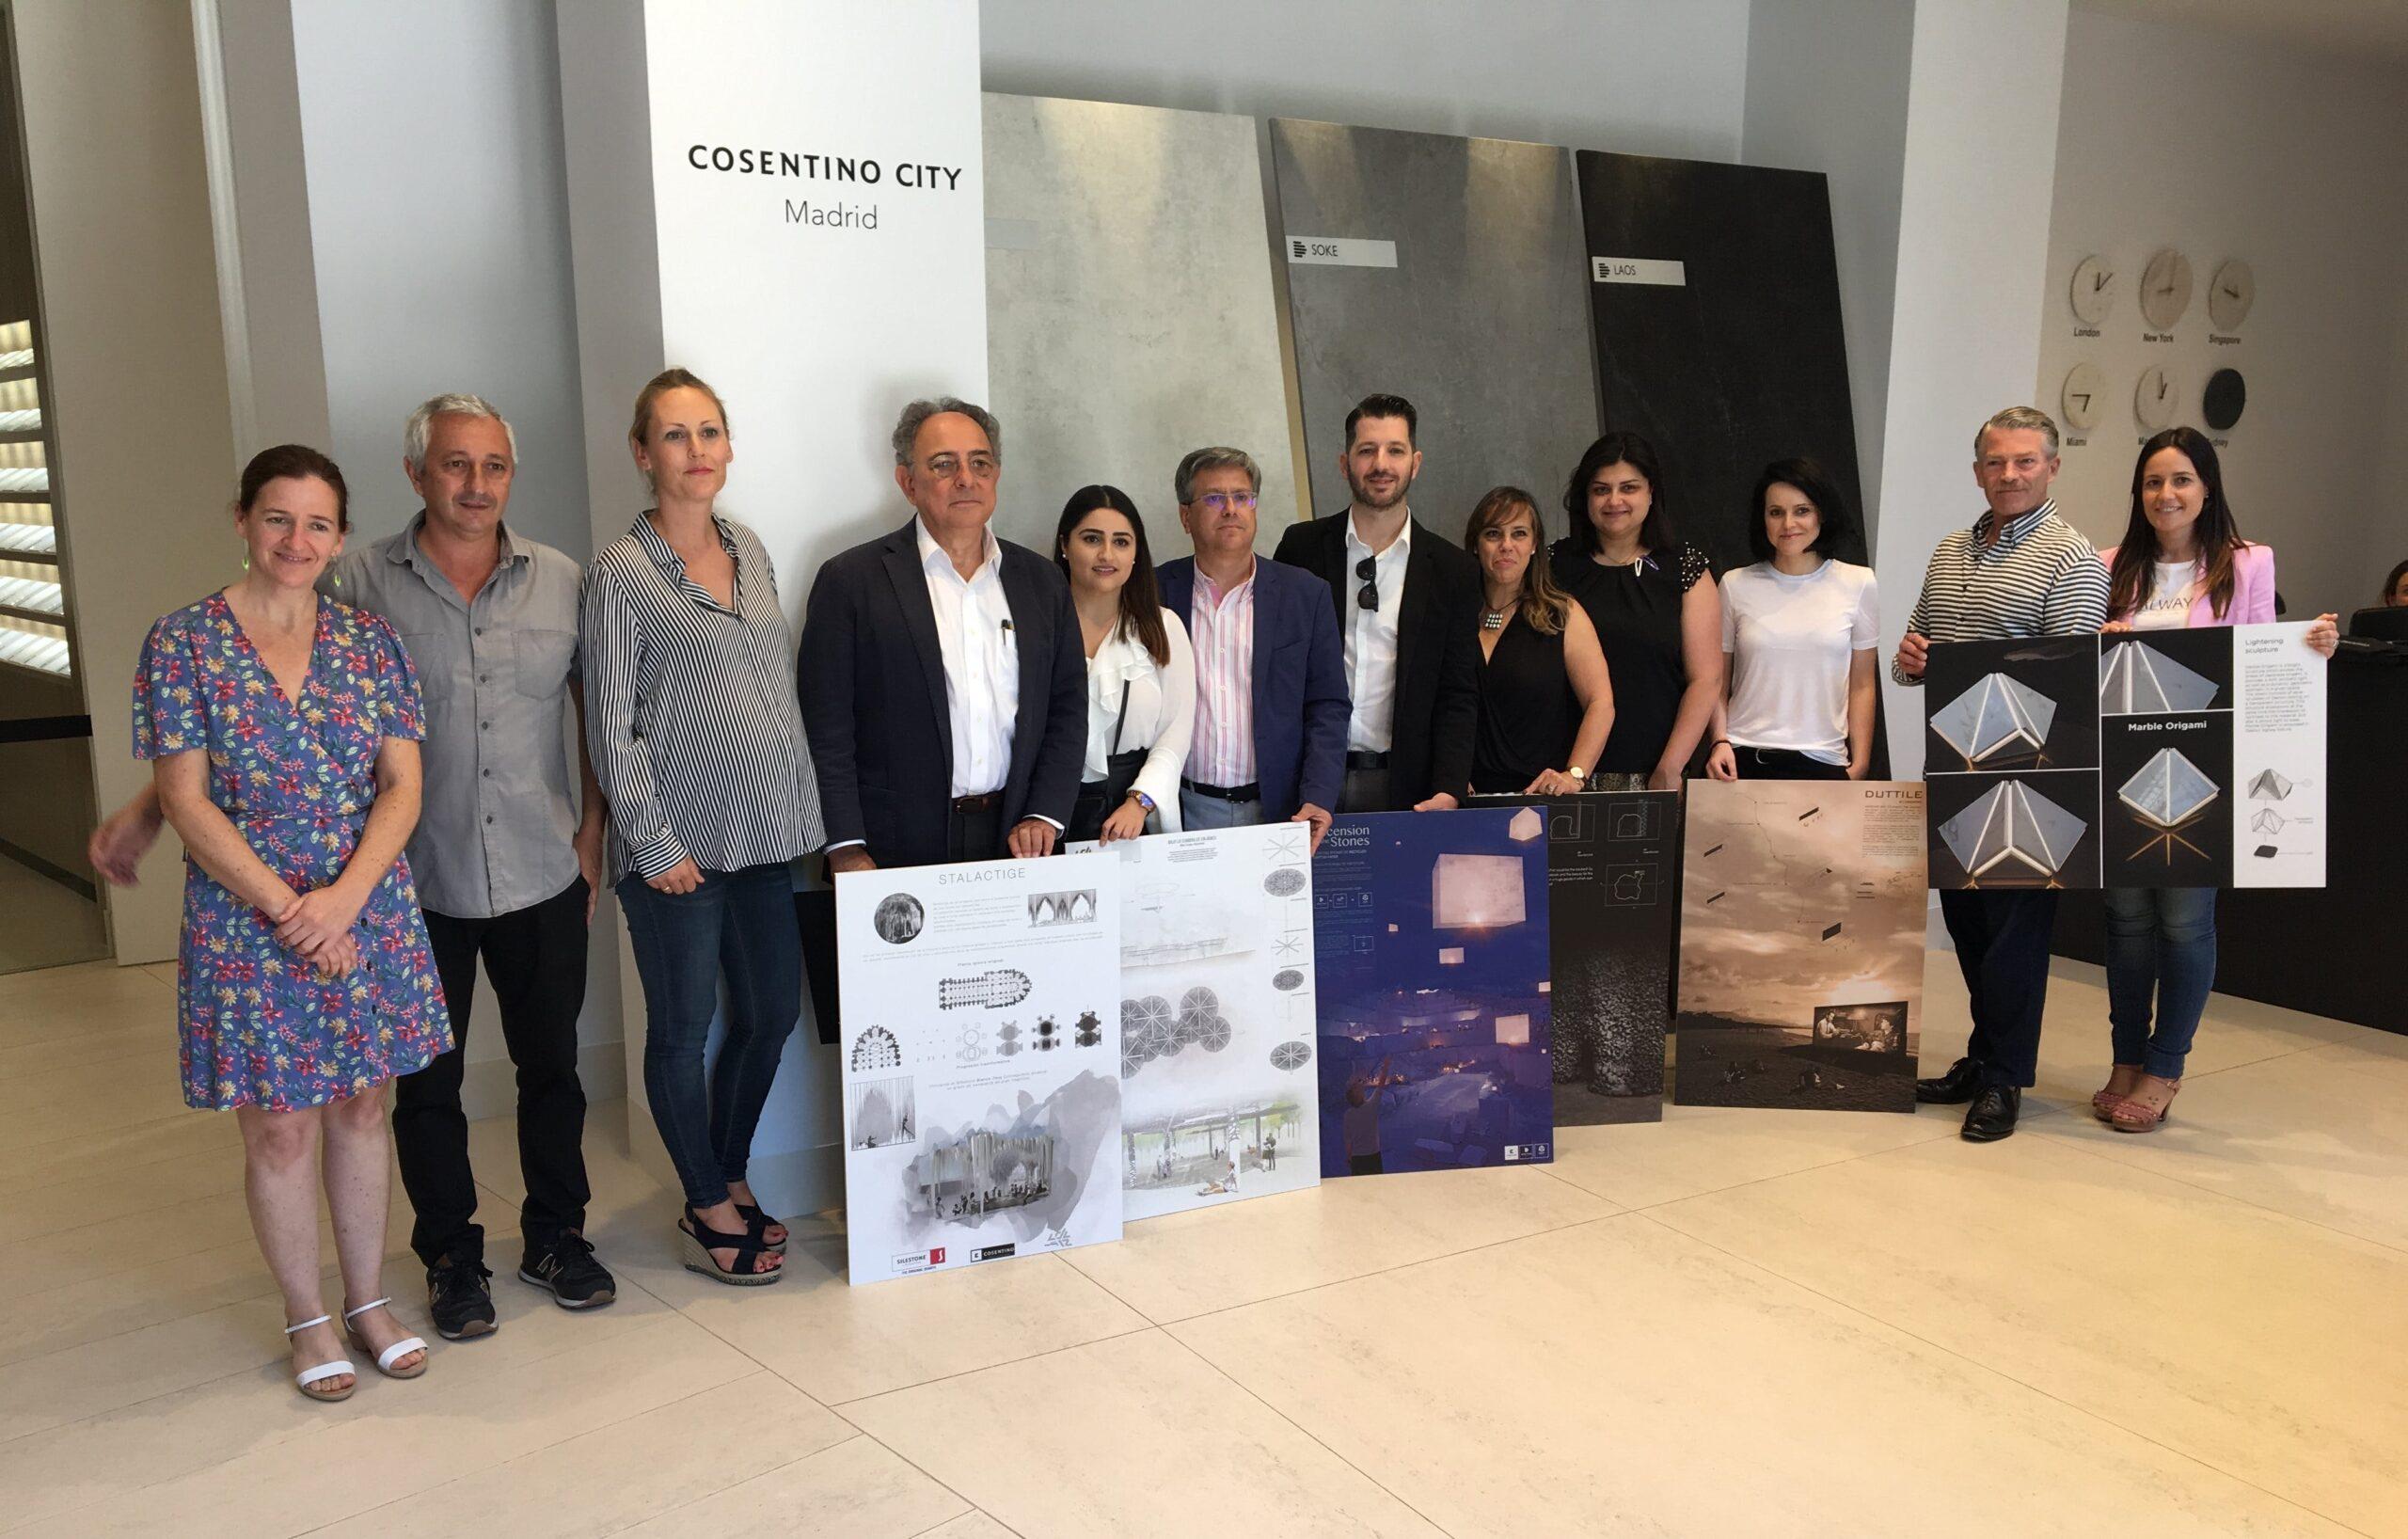 Image of Jurado Ganadores CDC12 2 1 1 scaled in 12th Cosentino Design Challenge Winners - Cosentino